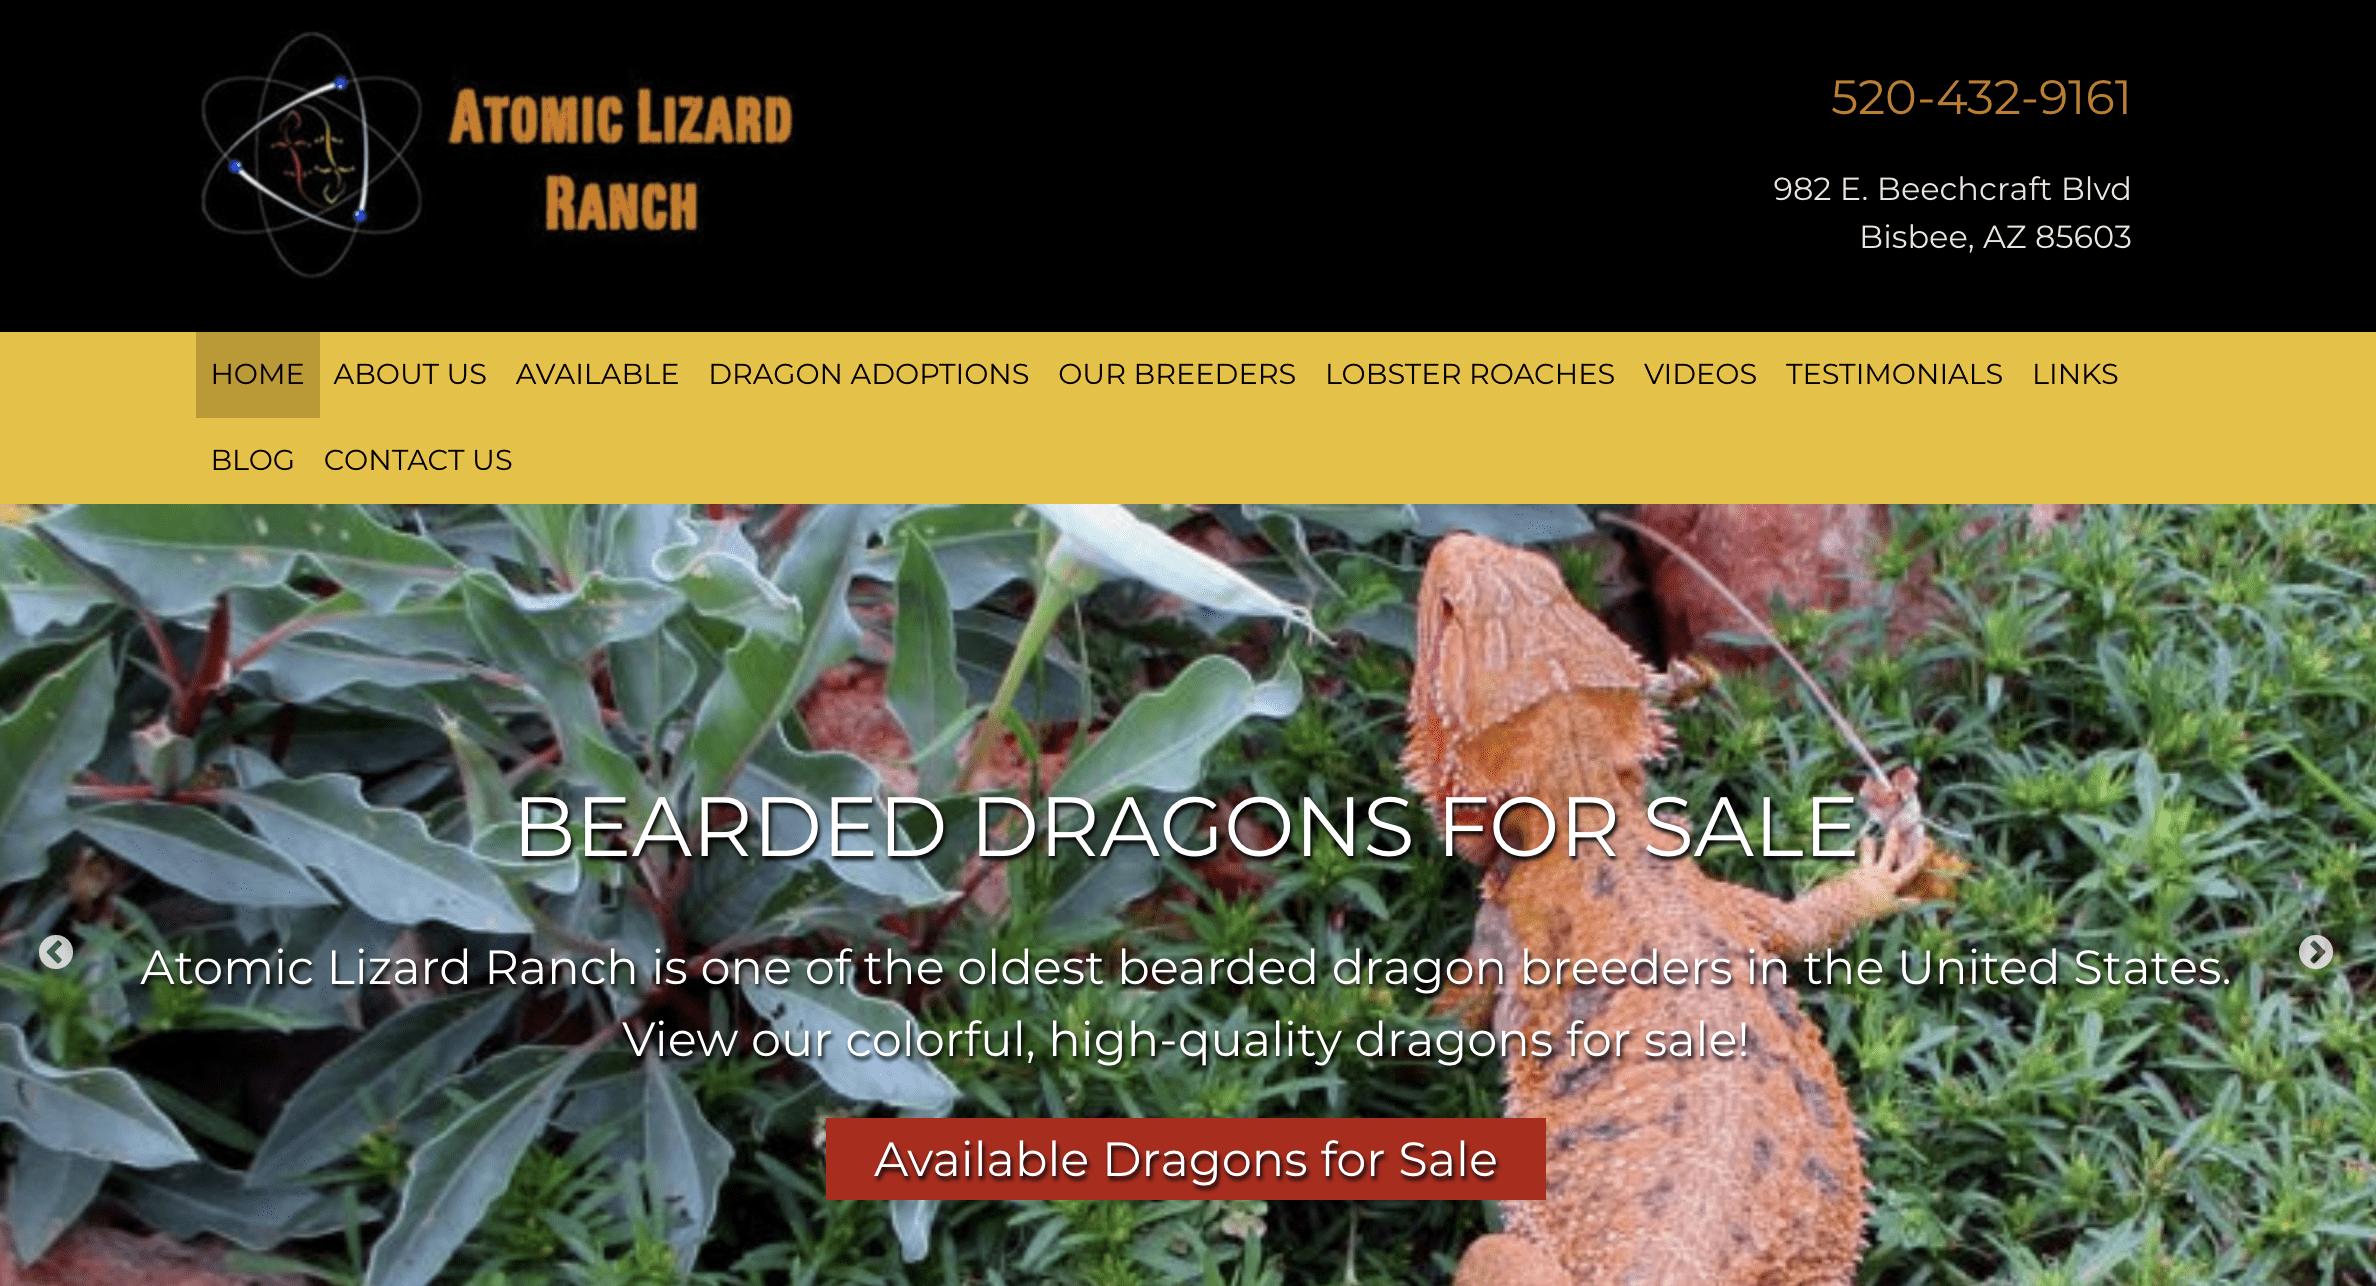 Atomic Lizard Ranch